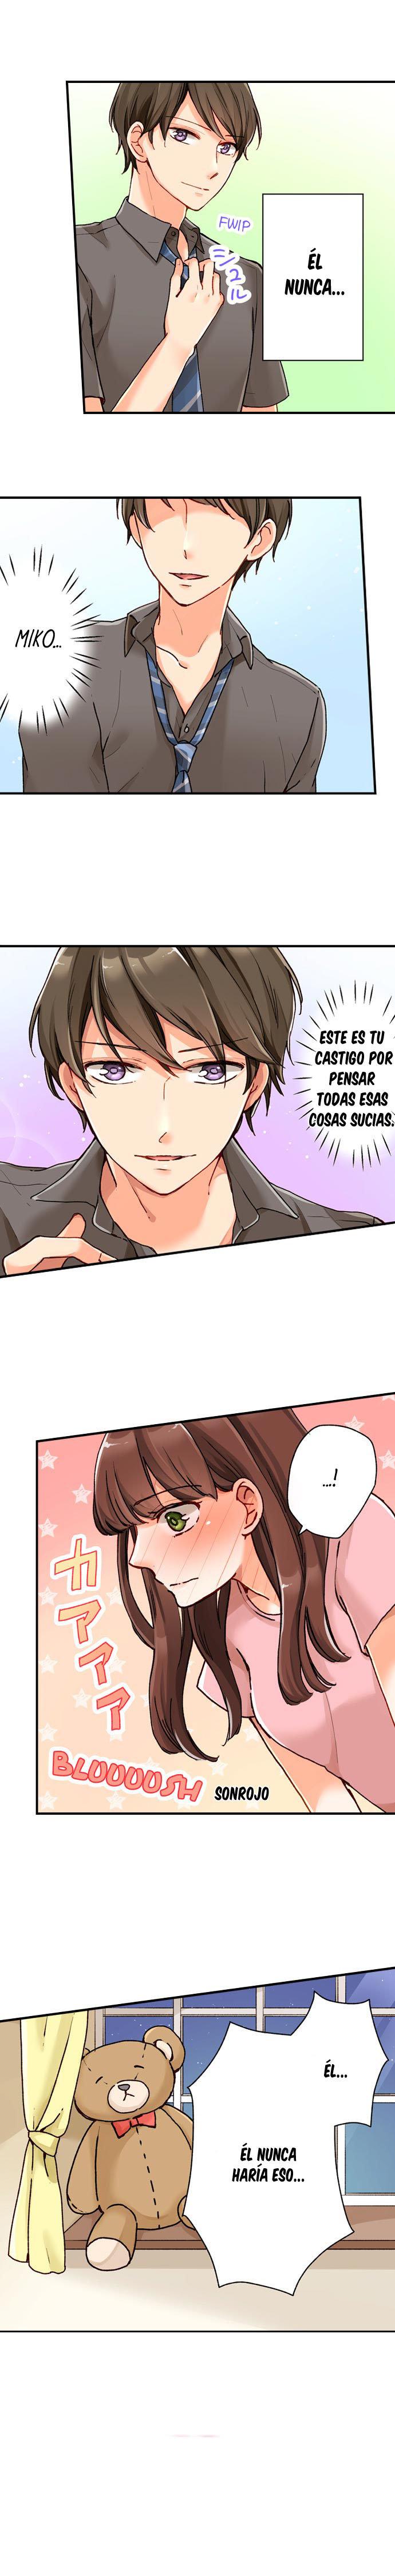 https://nine.mangadogs.com/es_manga/pic8/5/36677/946733/004152a48f6de777a672457f3619da9d.jpg Page 1